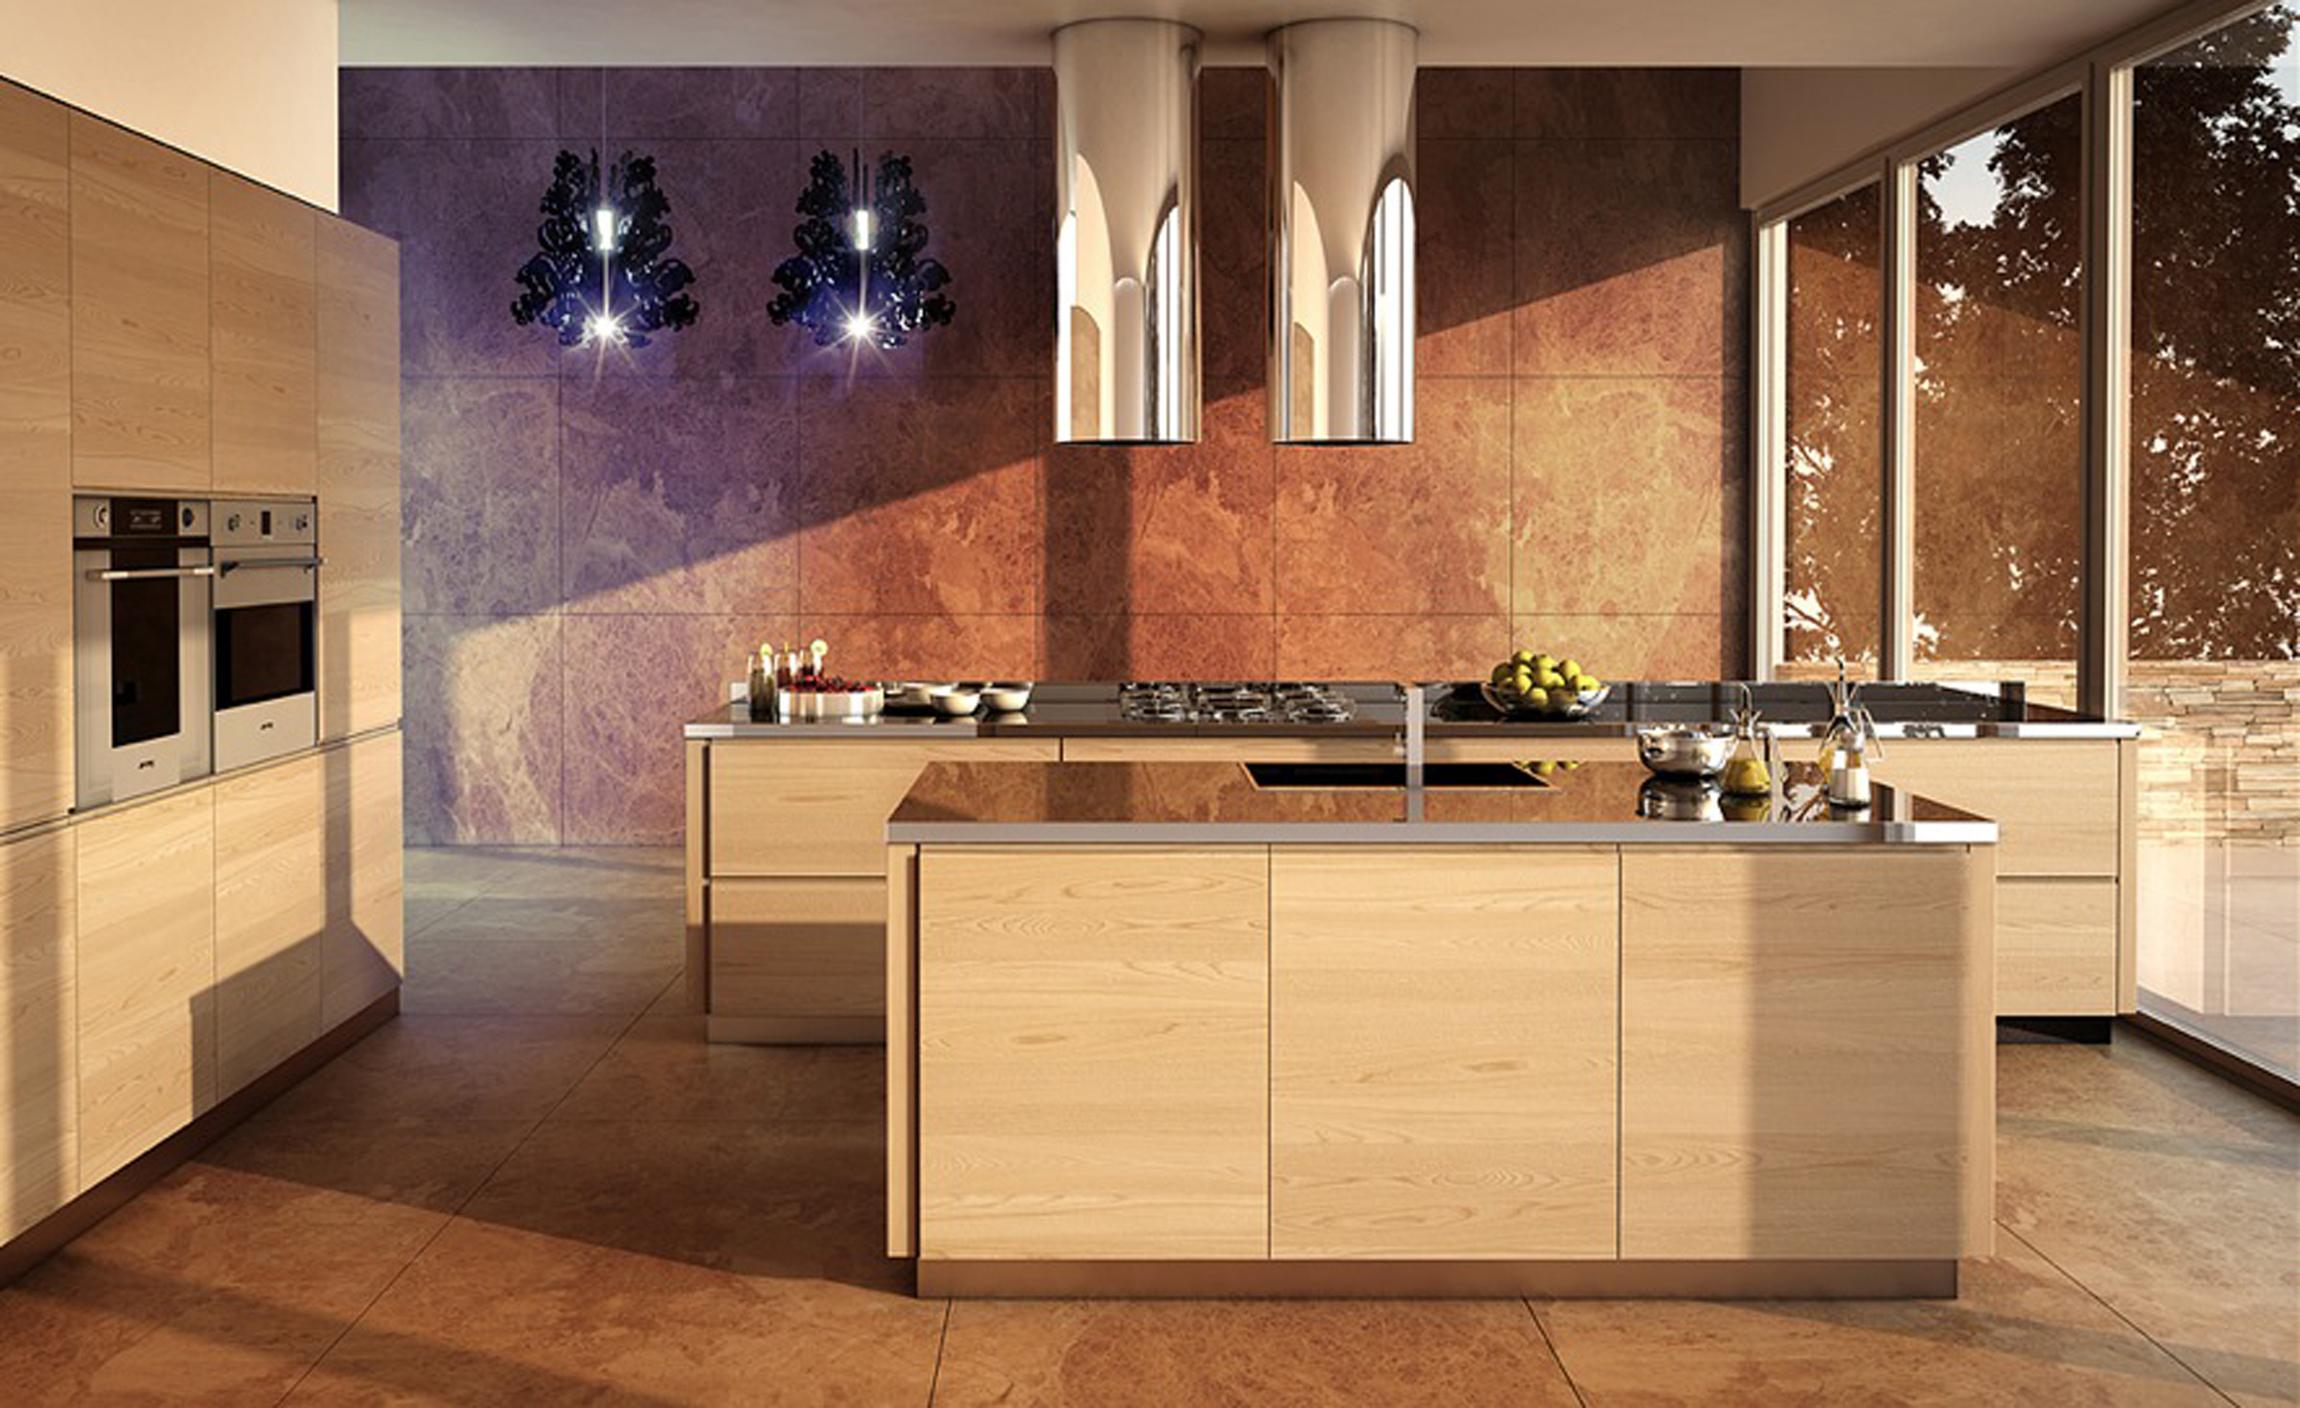 Modern Kitchen Fancy Lighting (View 11 of 31)